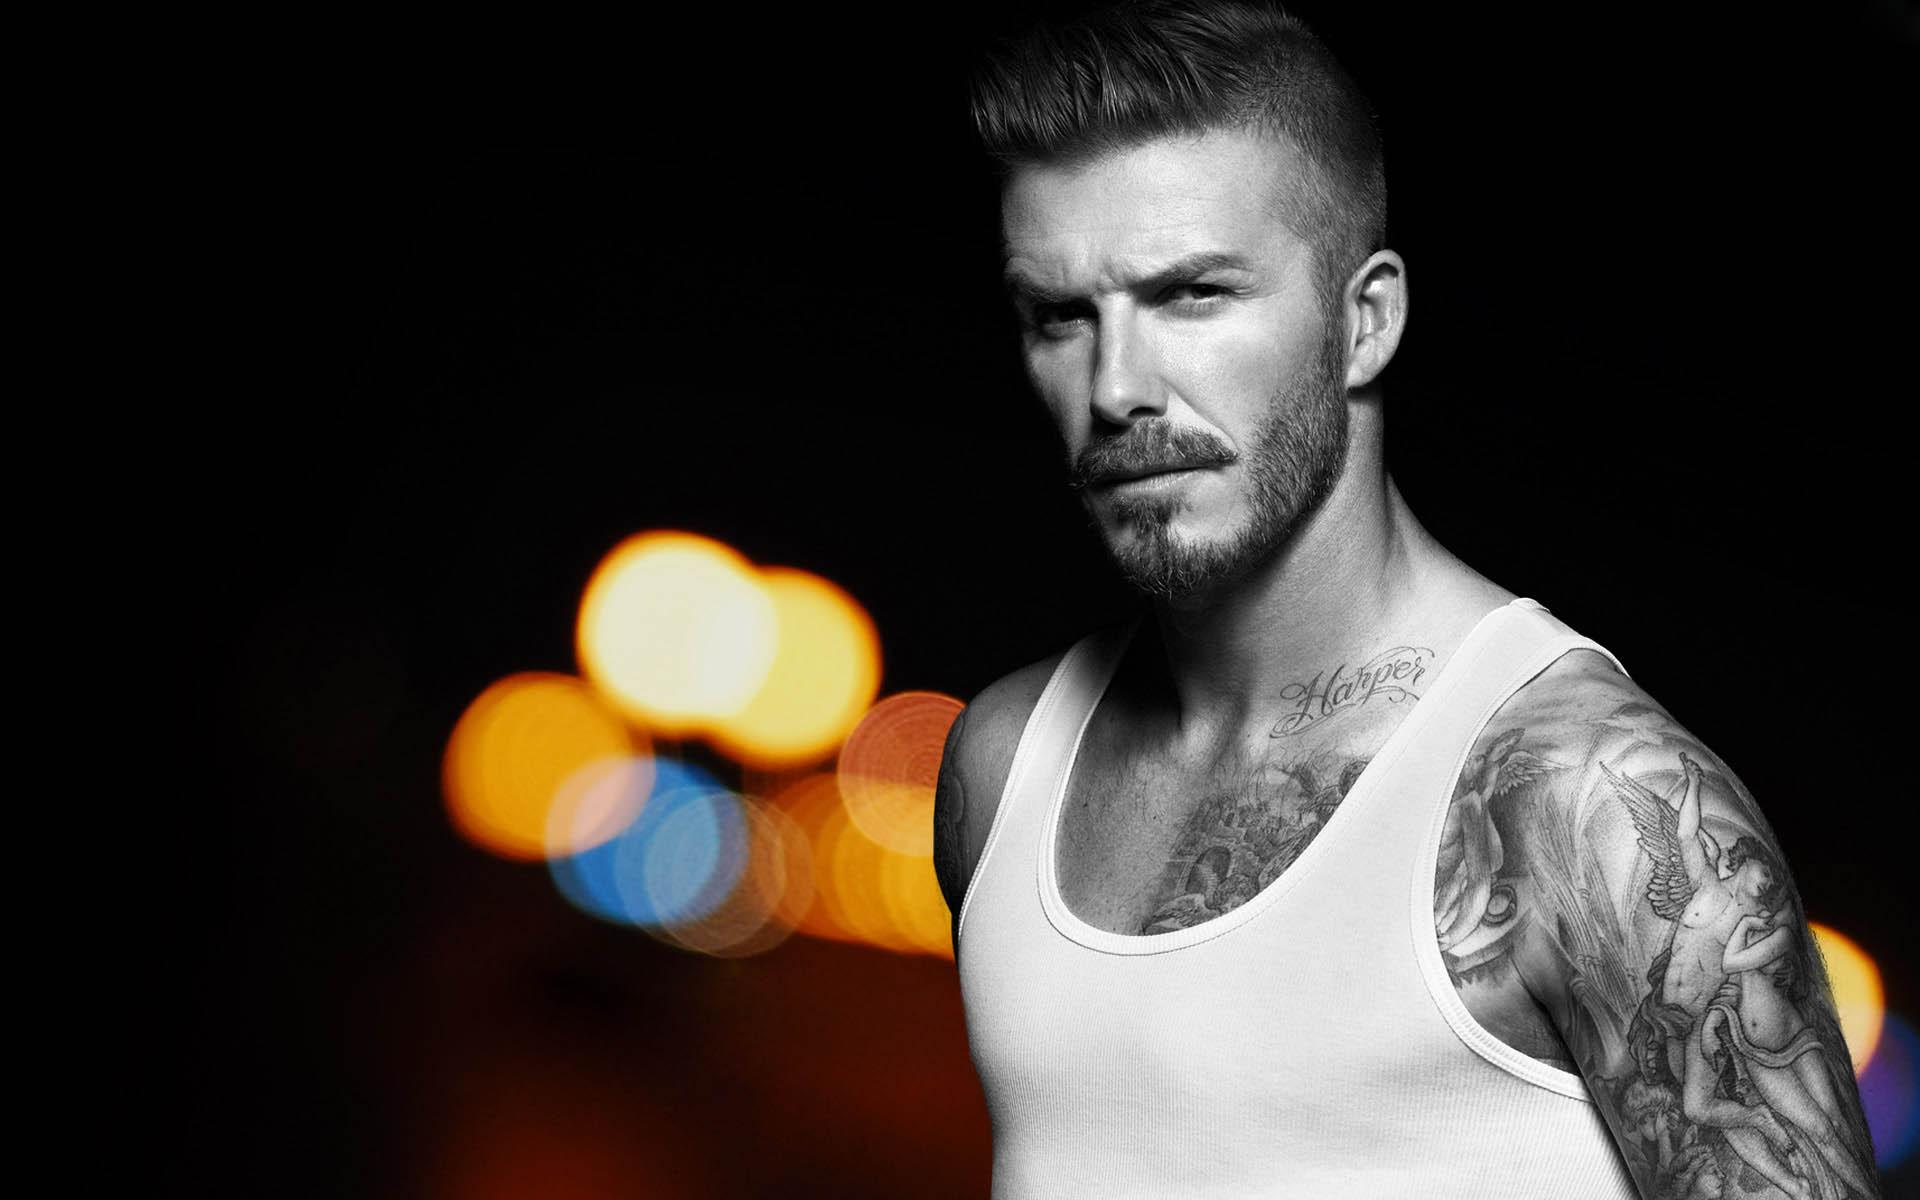 David Beckham PSG HD Wallpaper